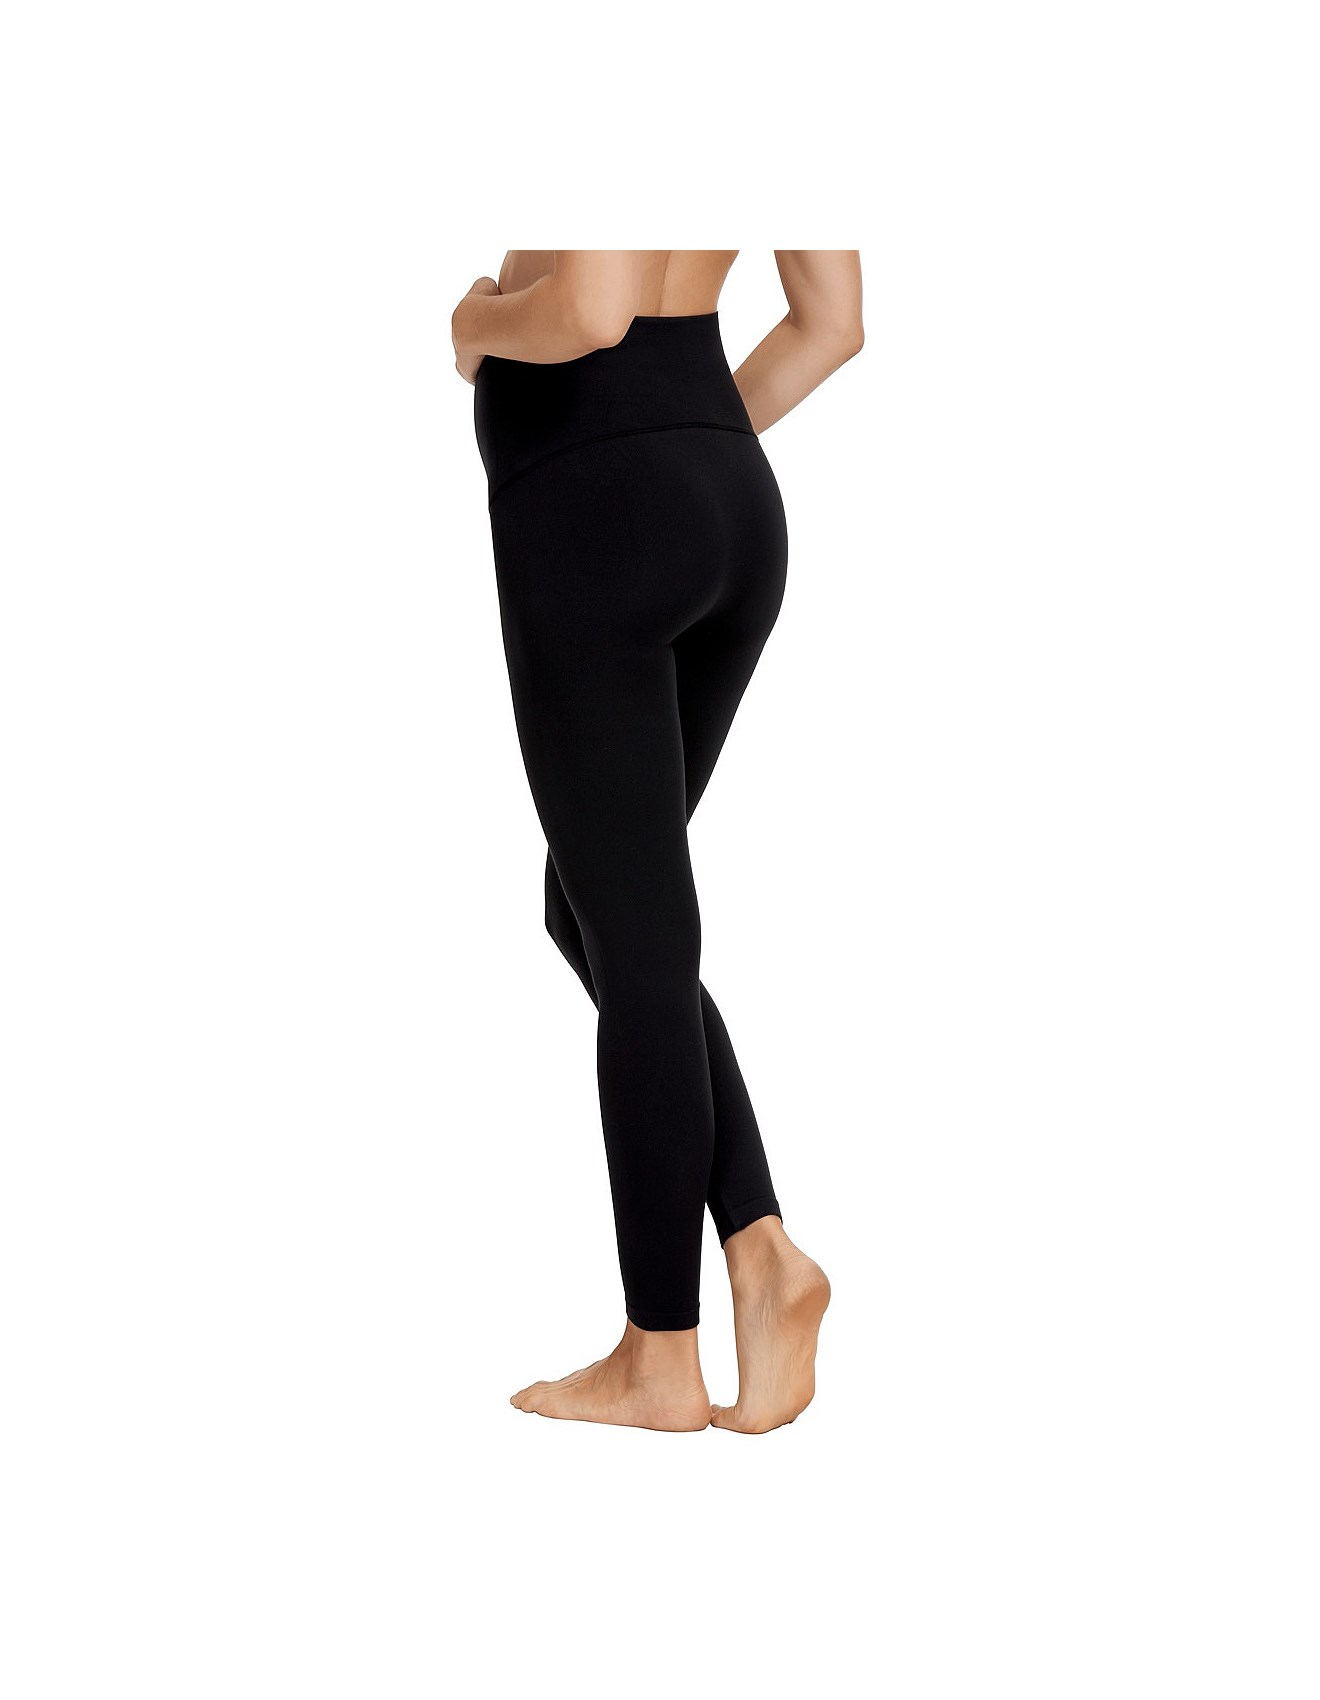 dd08cc176548e Maternity Skinny Legging Special Offer. 1